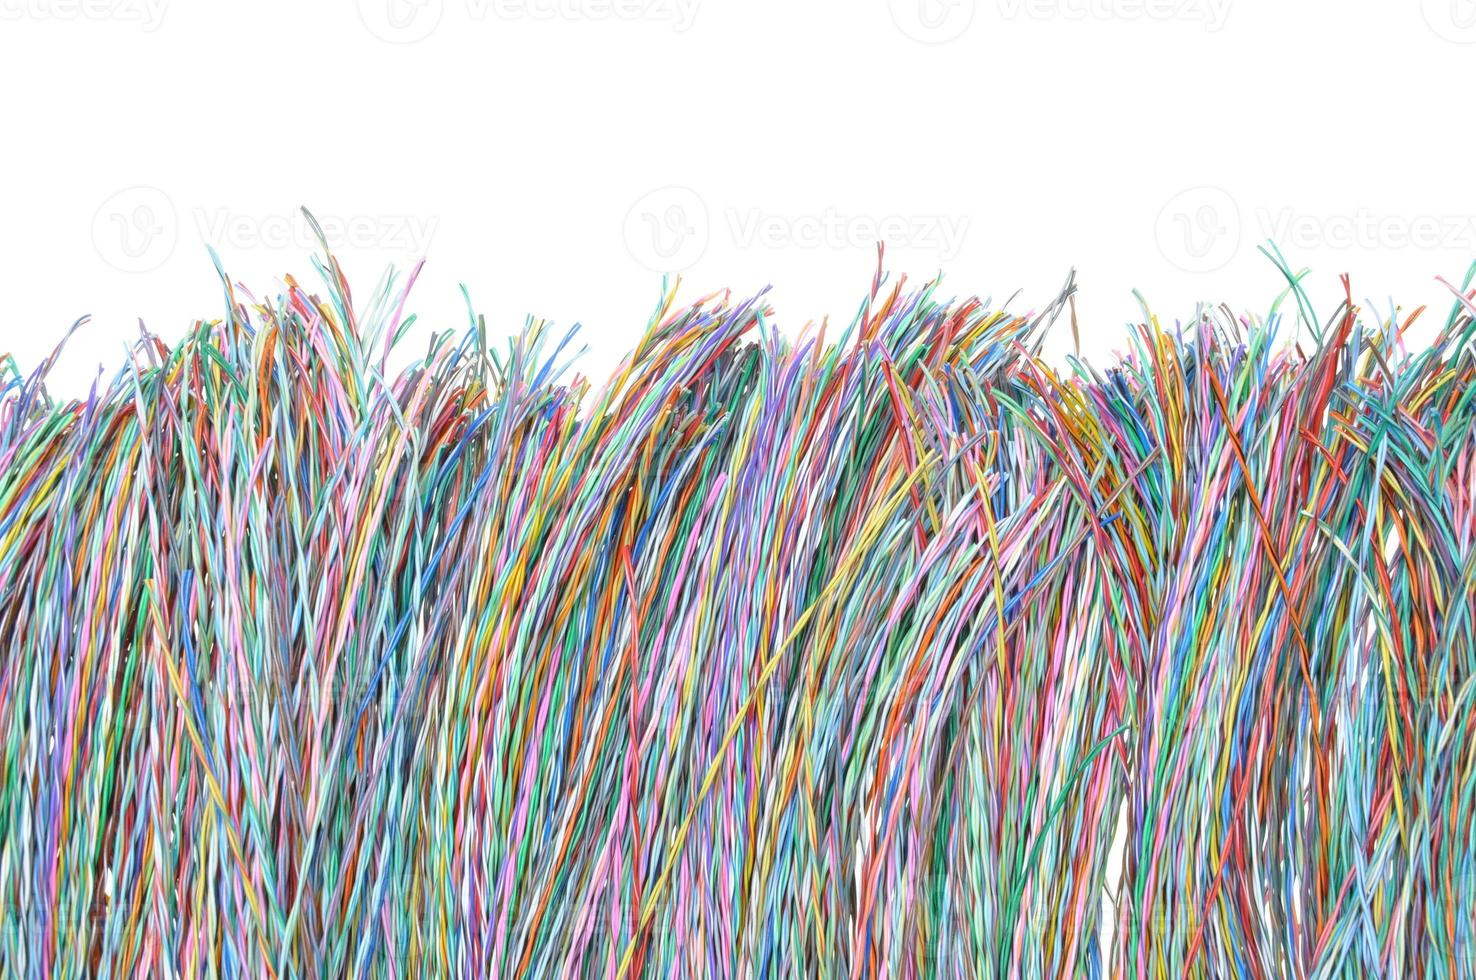 farbige Telekommunikationskabel und -drähte foto